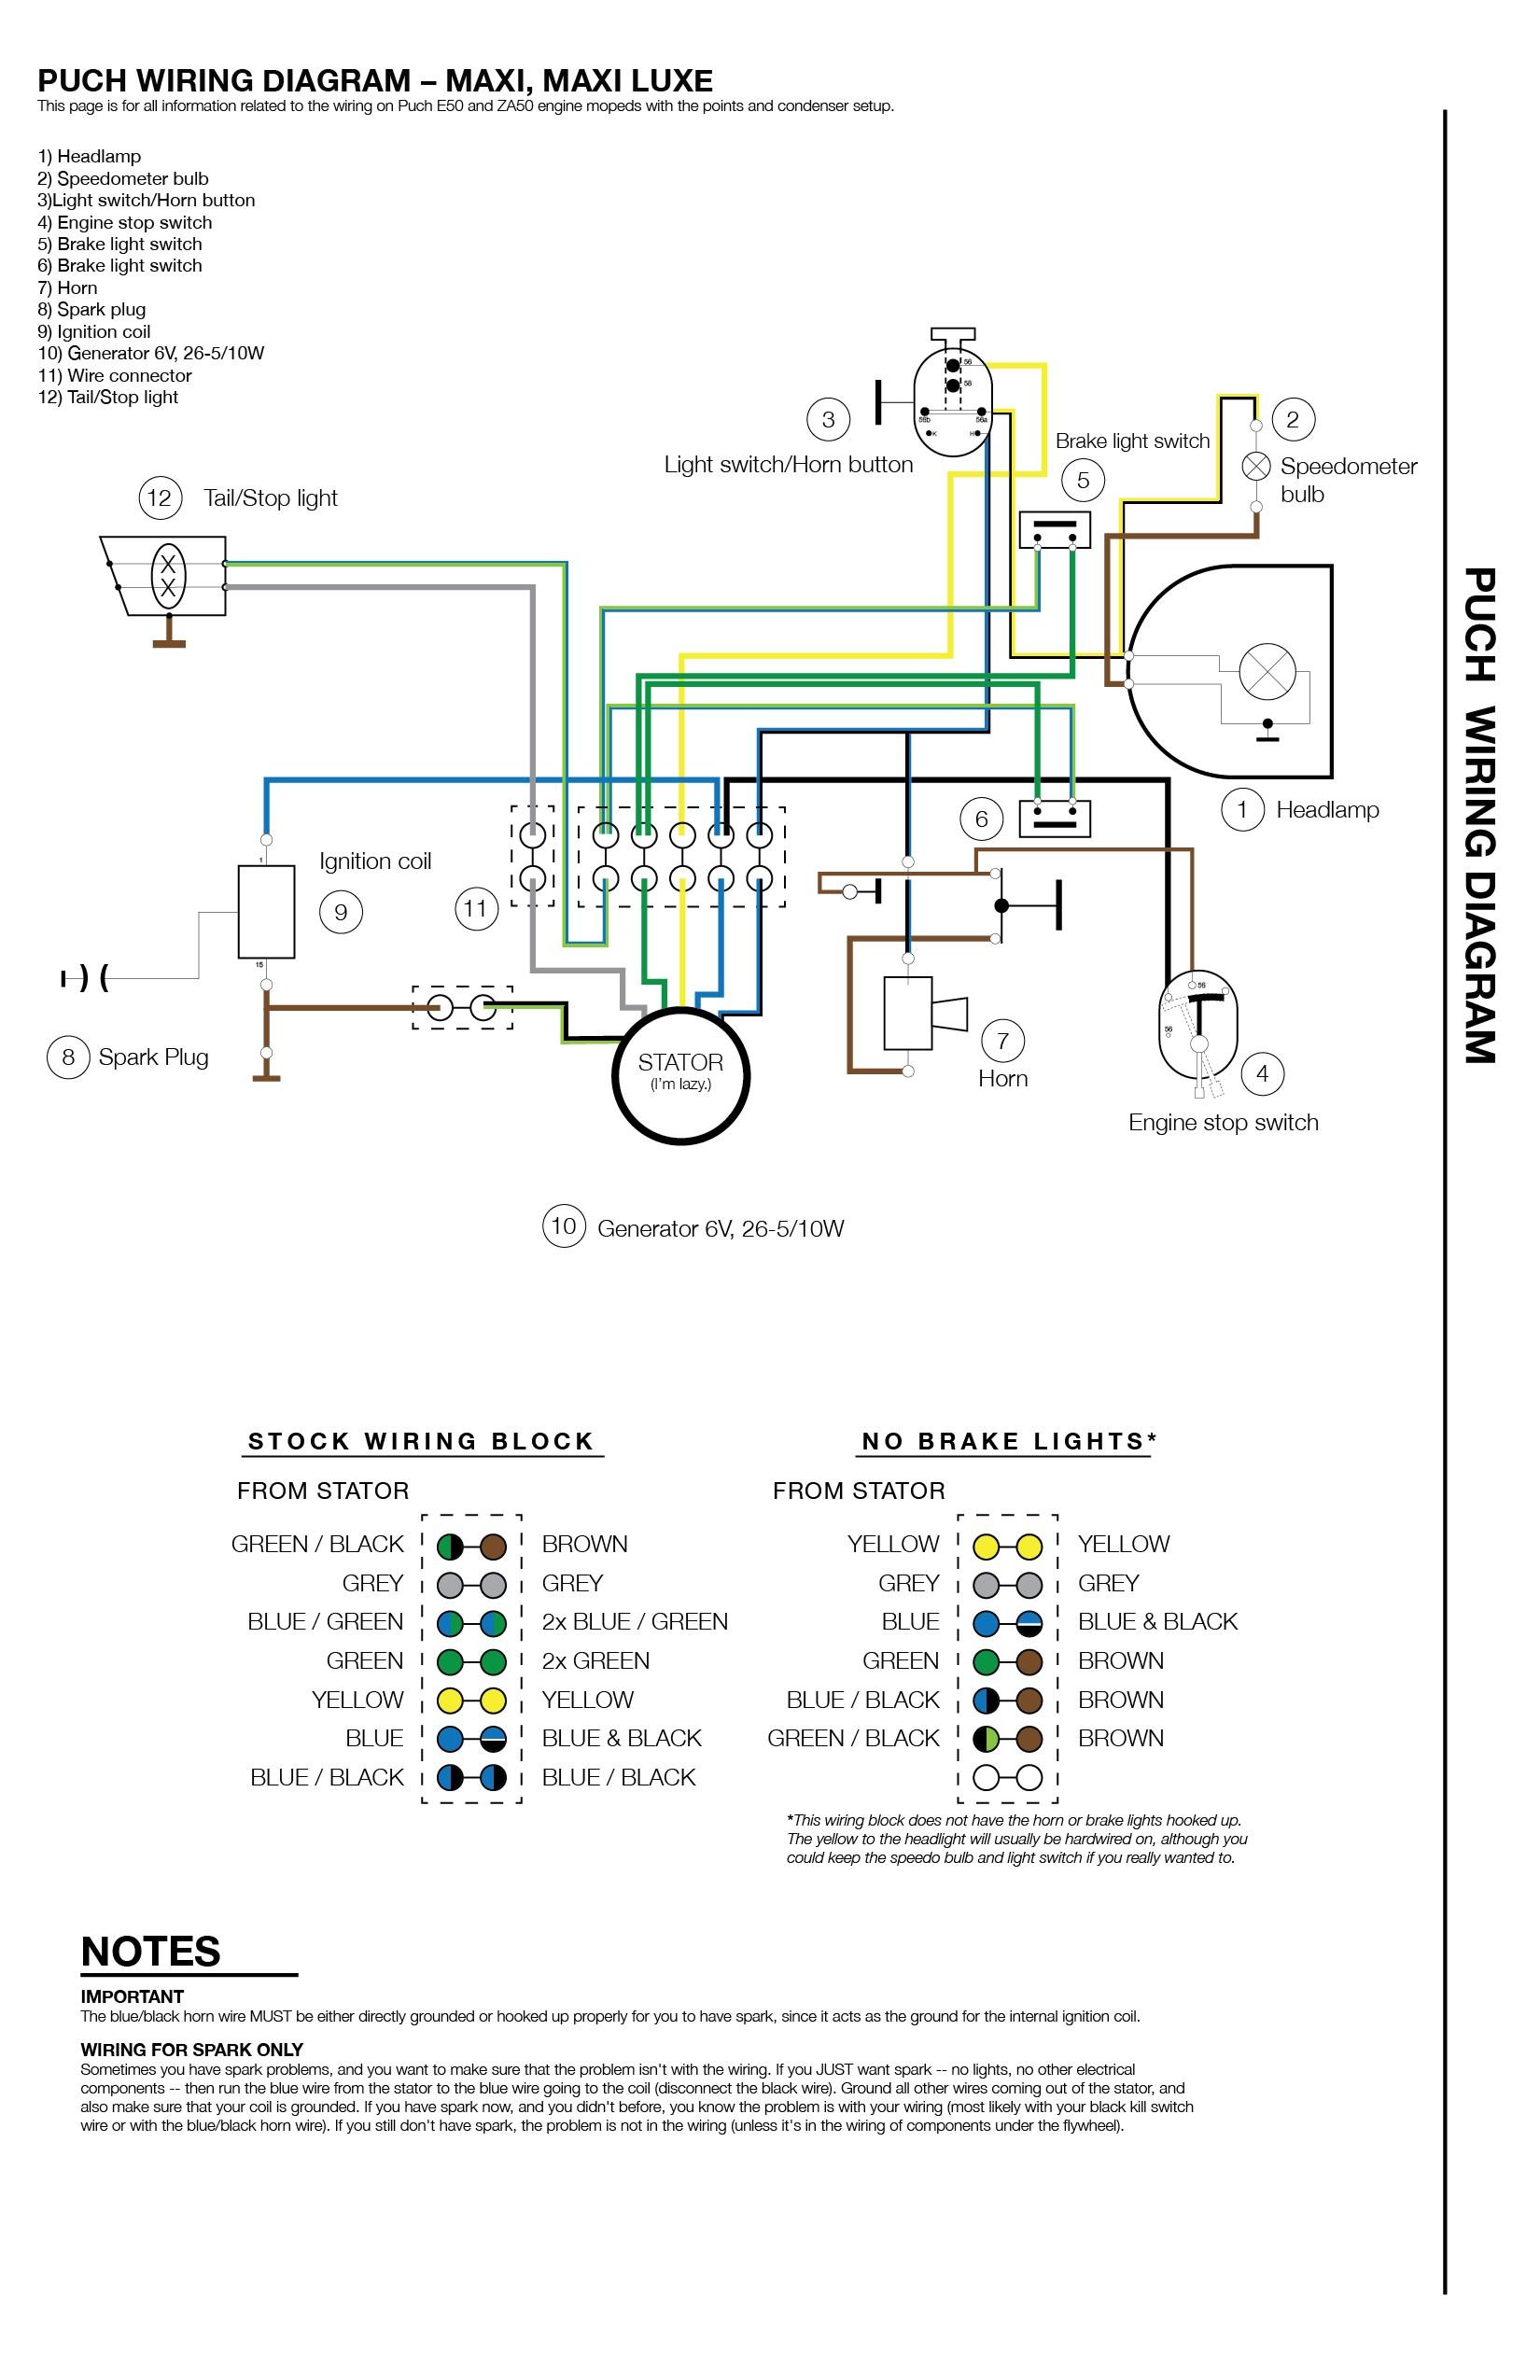 4 Stroke Dirt Bike Engine Diagram 296e2 Moped Engine Diagram Of 4 Stroke Dirt Bike Engine Diagram